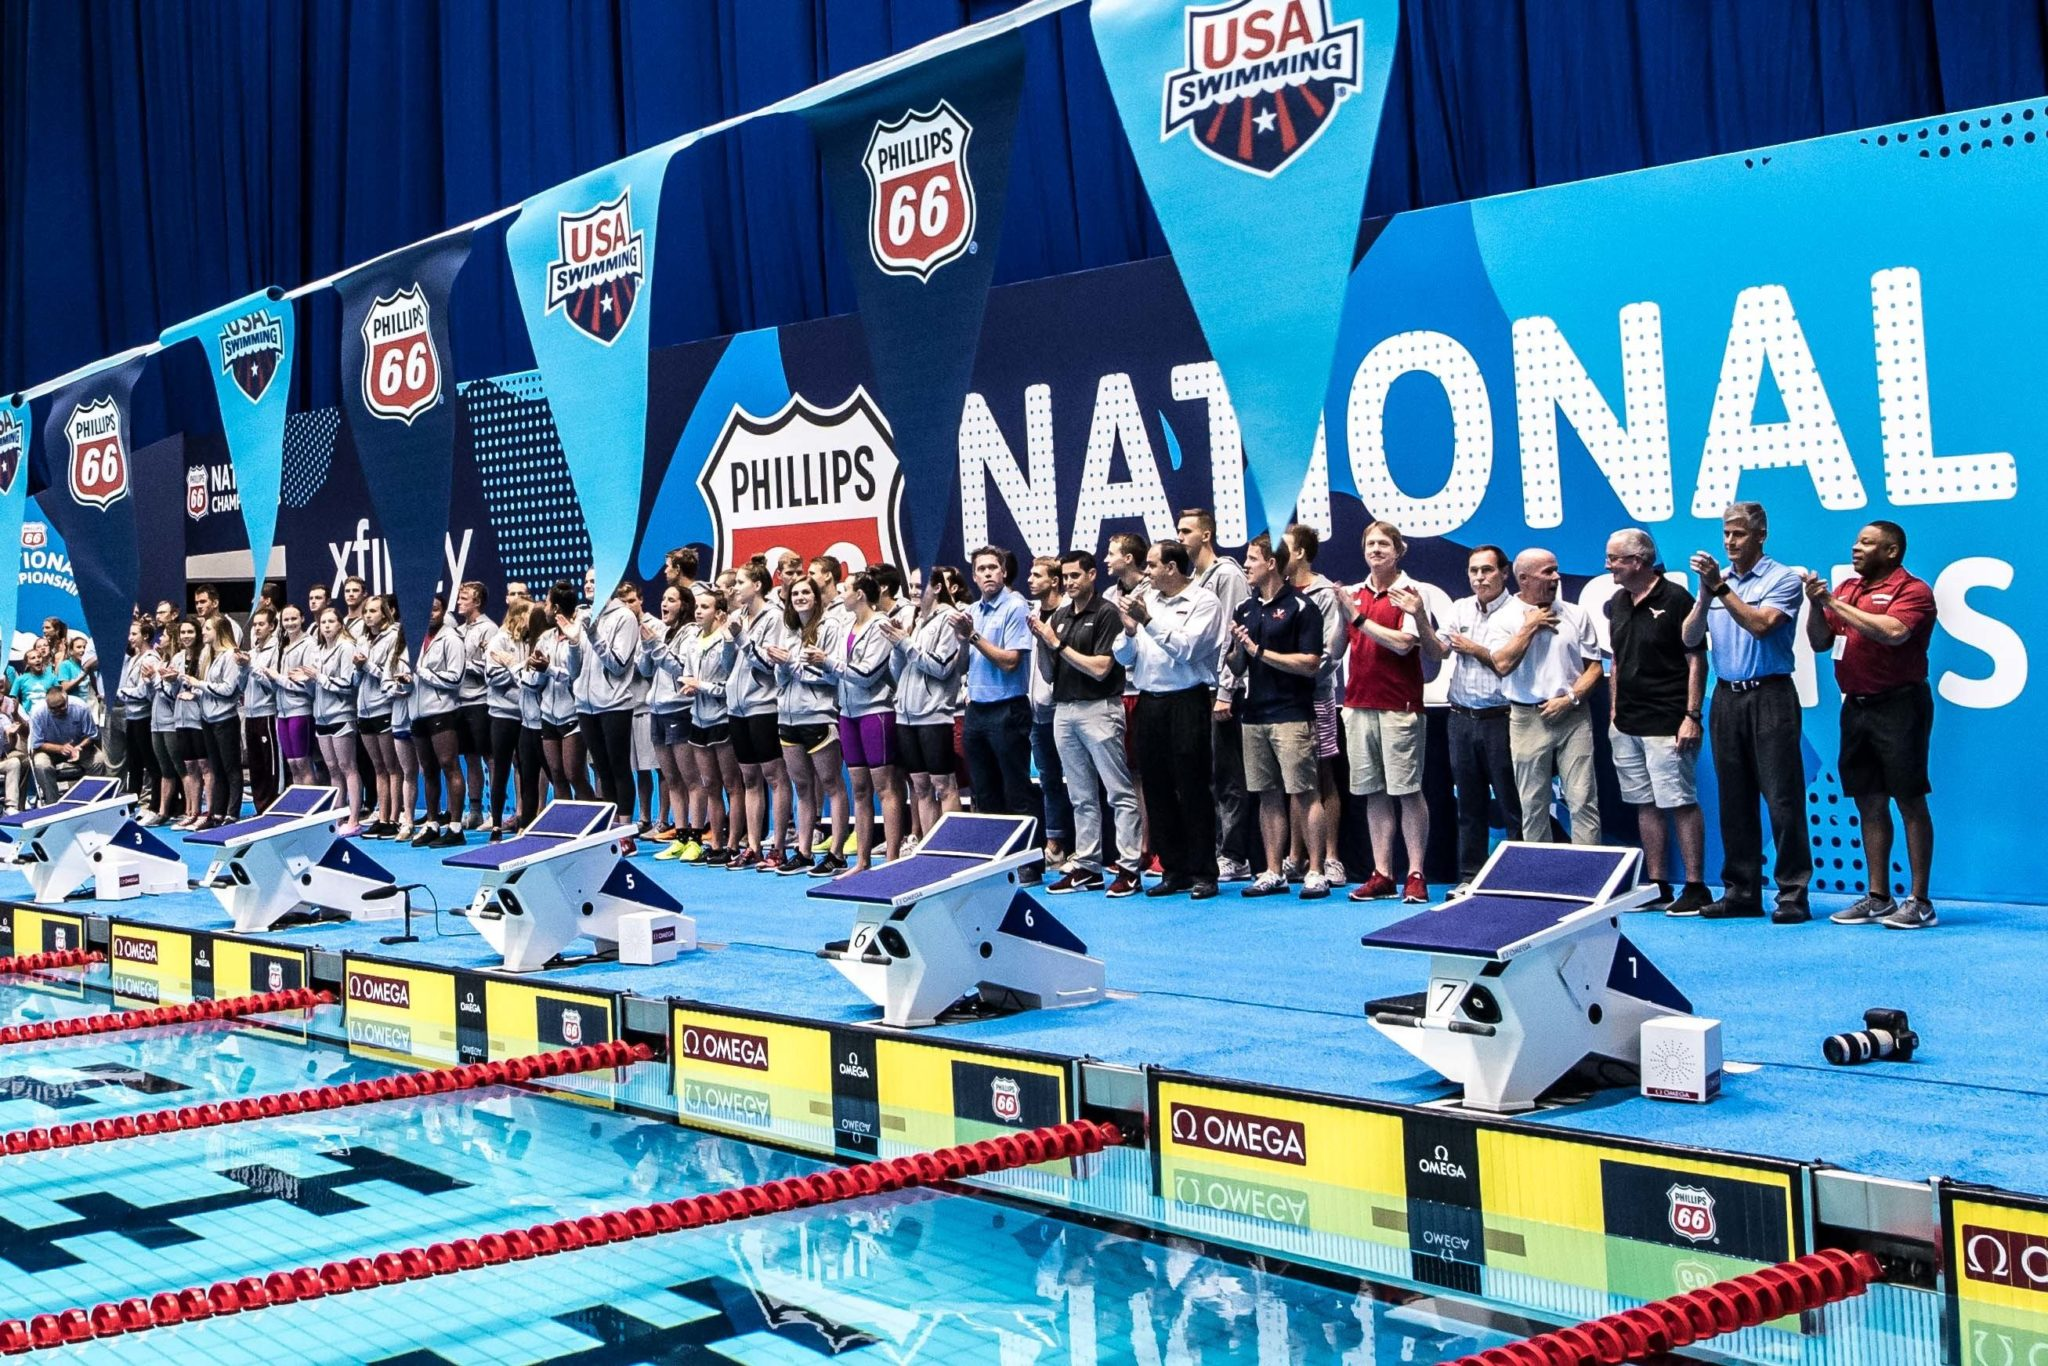 How was the World Aquatics Championship 2017 40